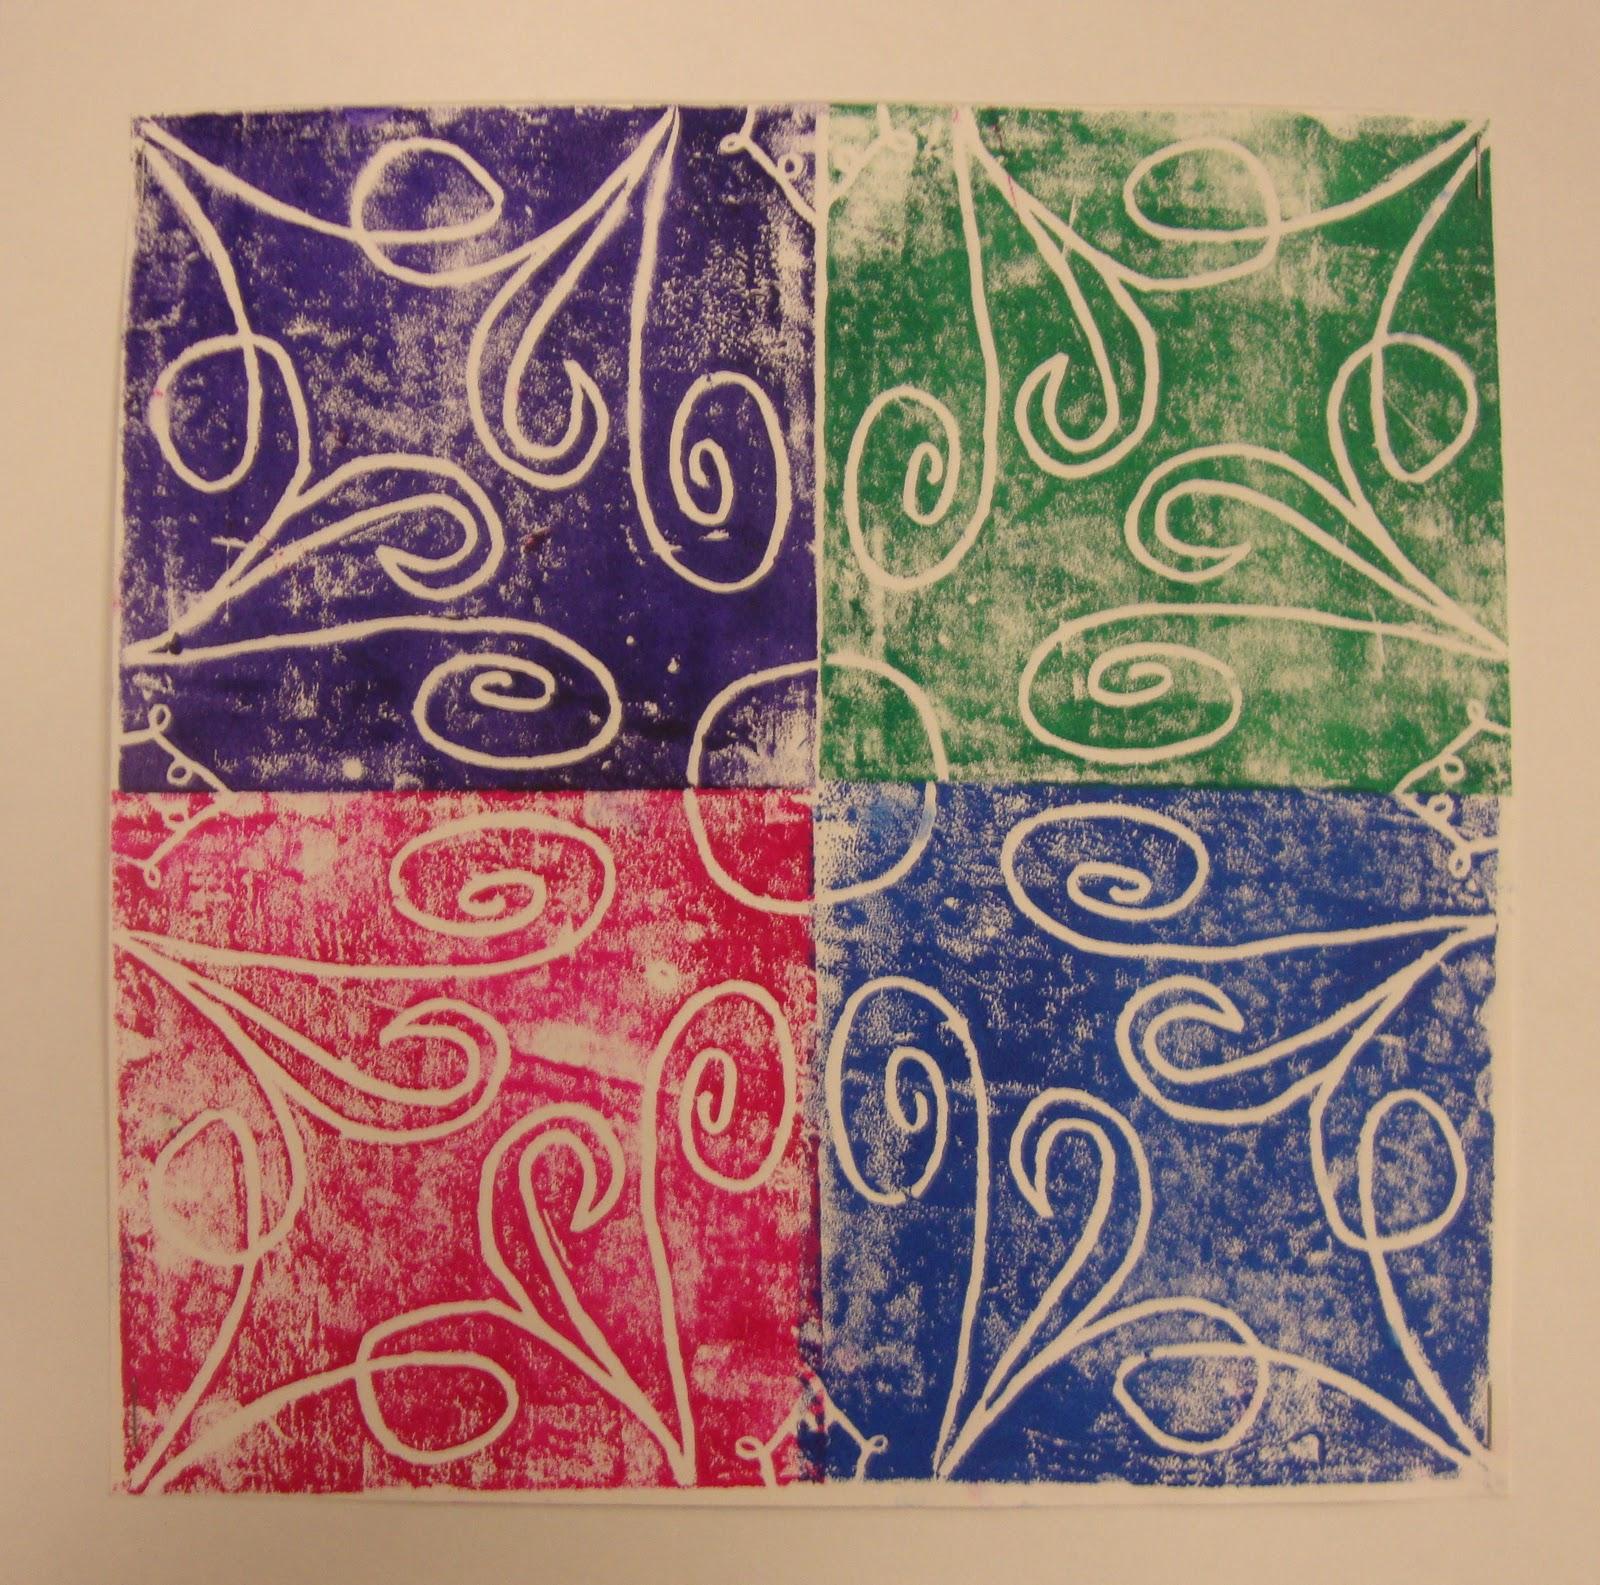 Art Paper Scissors Glue Radial Symmetry Prints